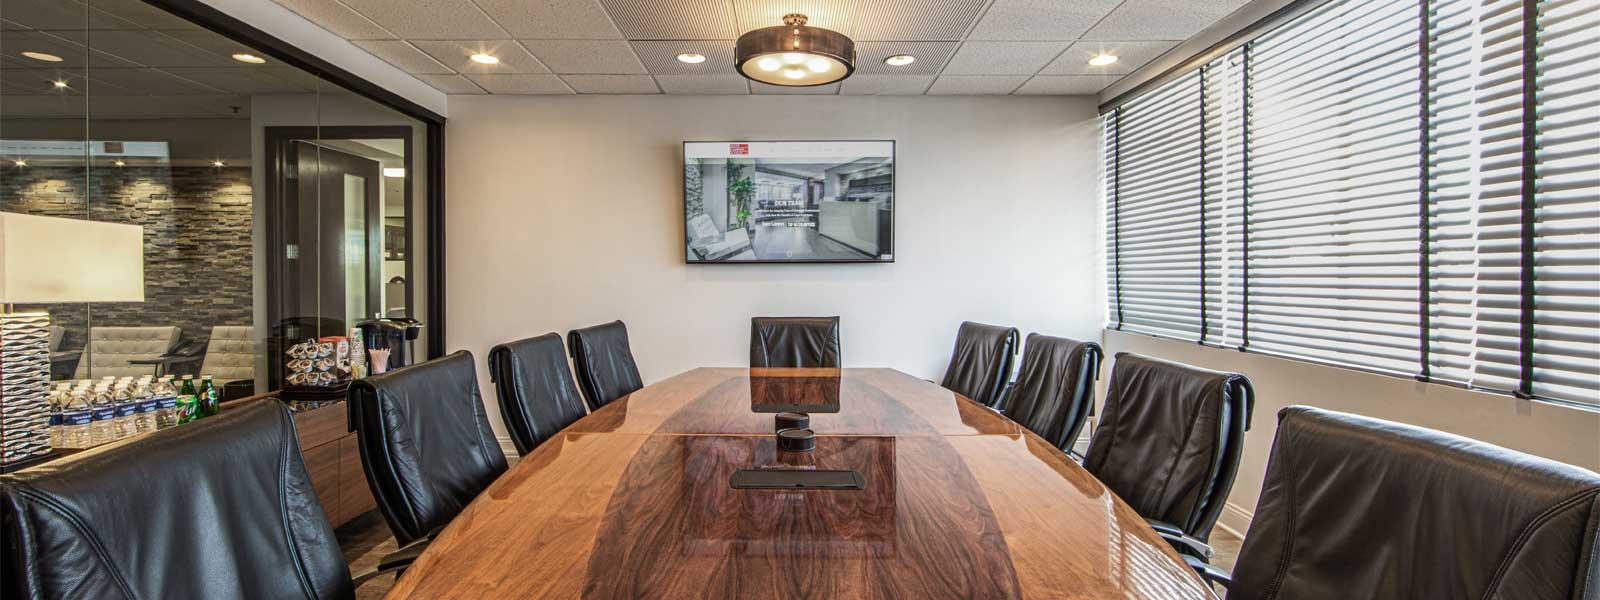 Main Conference Room at Ecoff Campain & Tilles, LLP